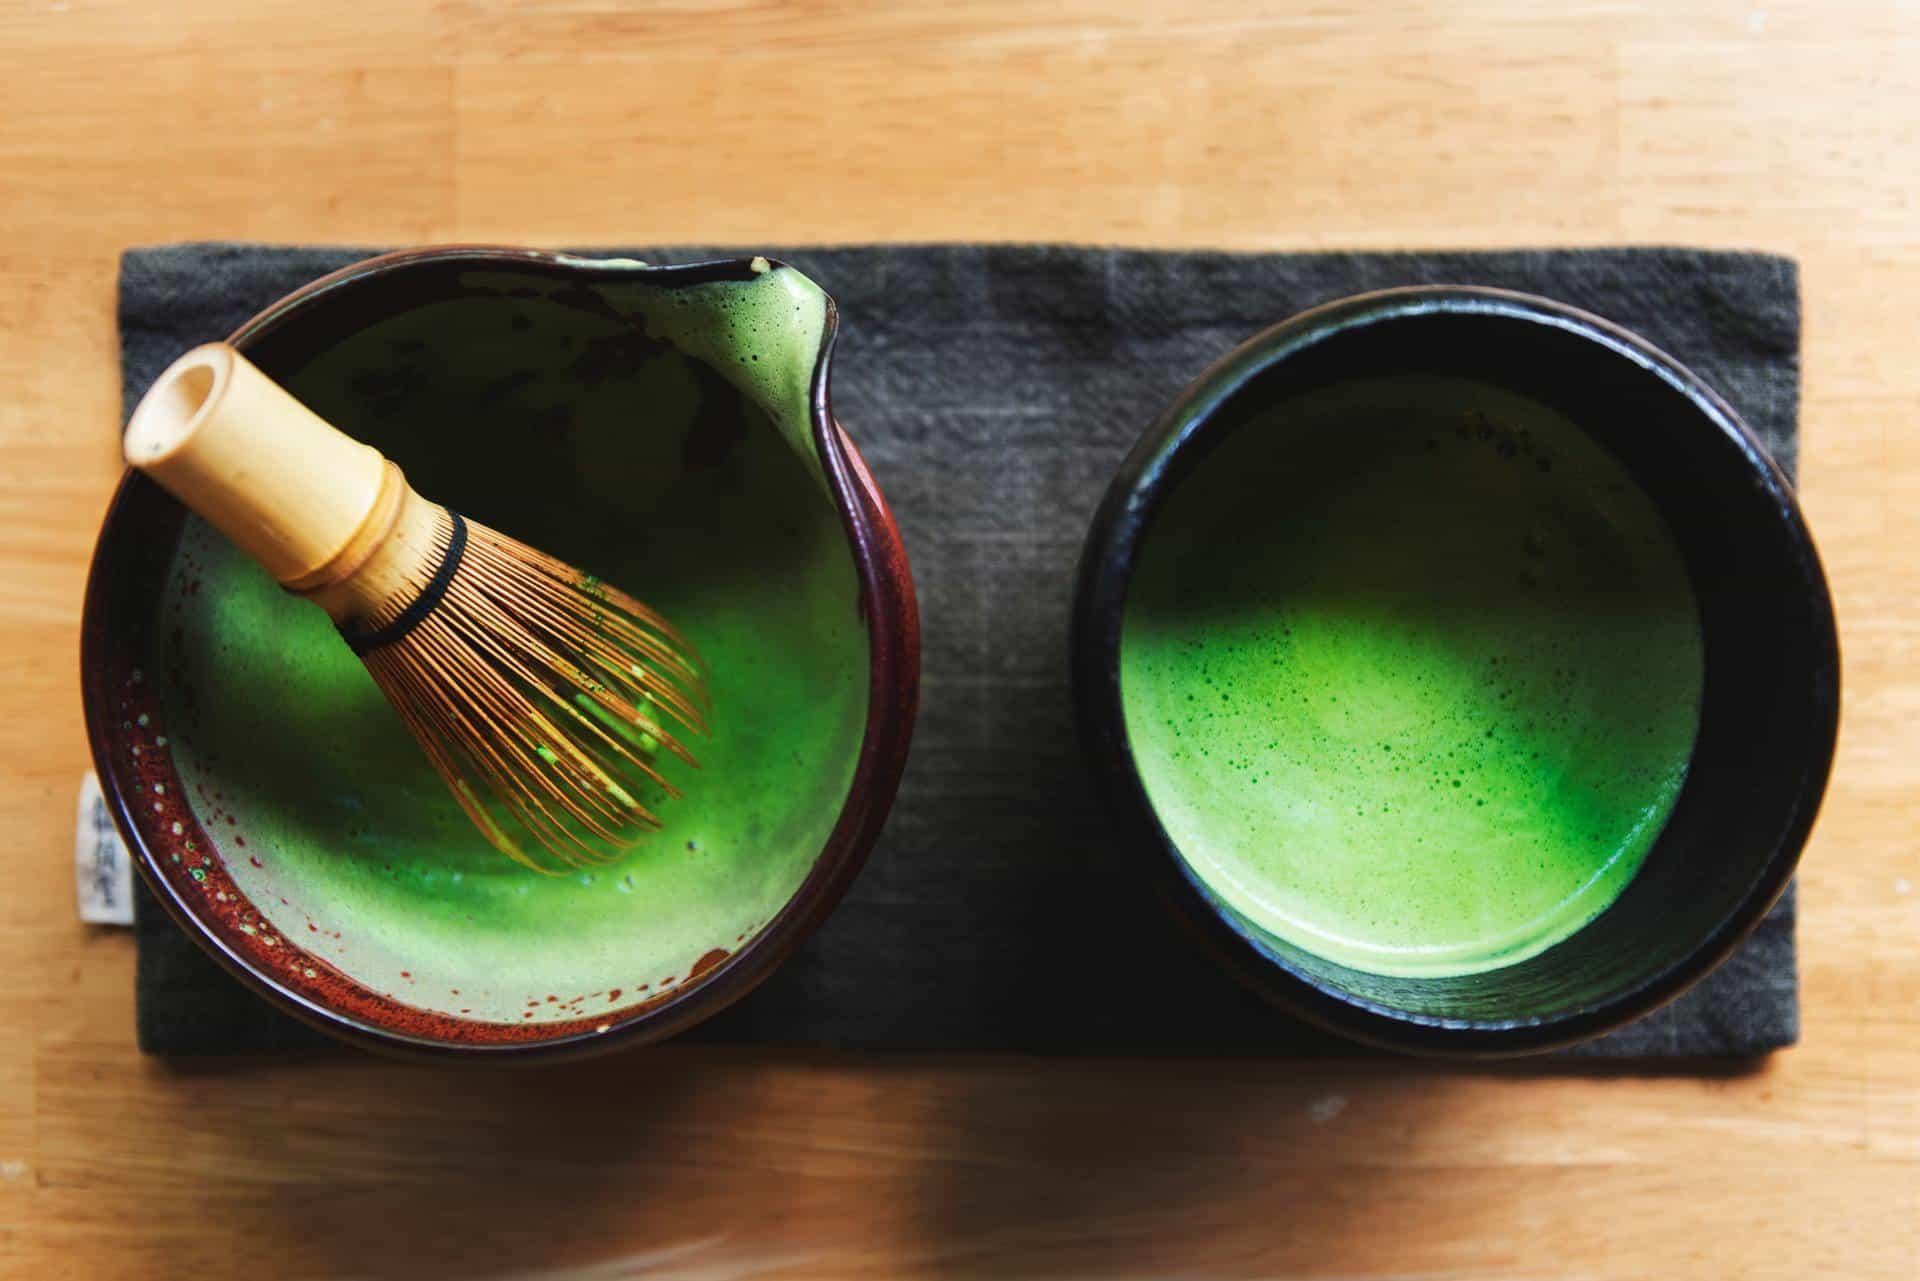 bamboo whisk matcha tea